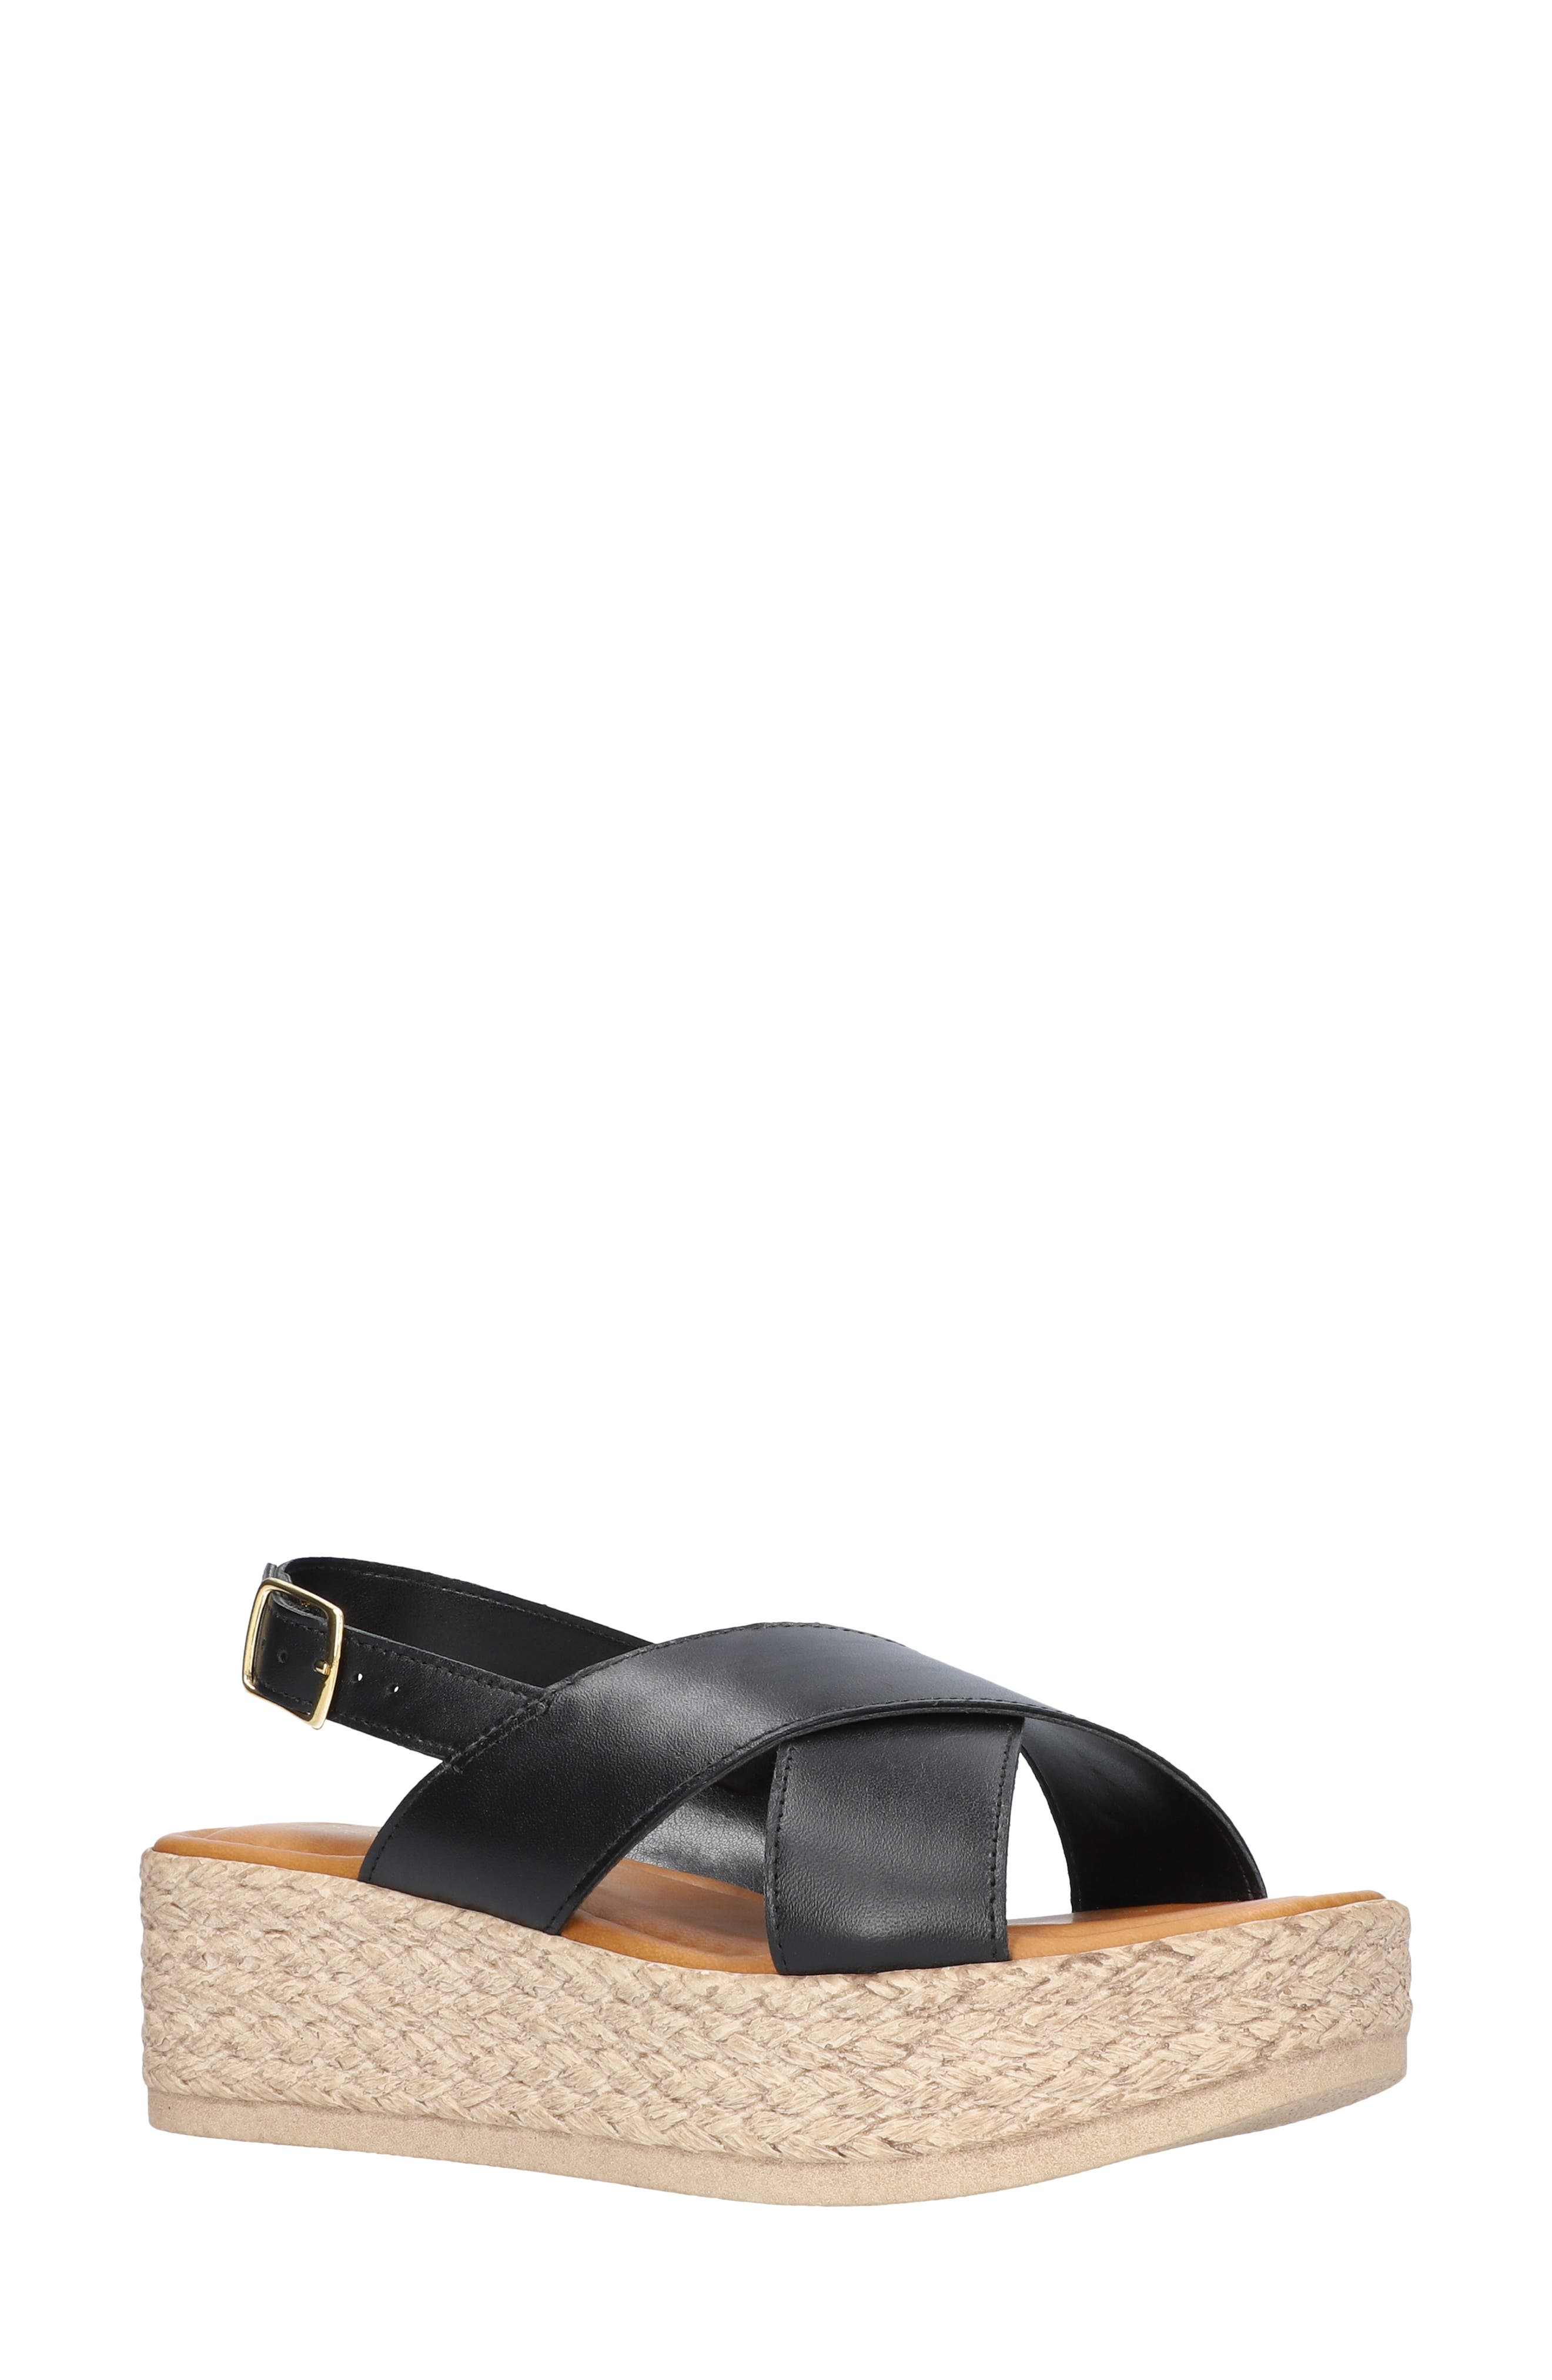 Mar Platform Sandal